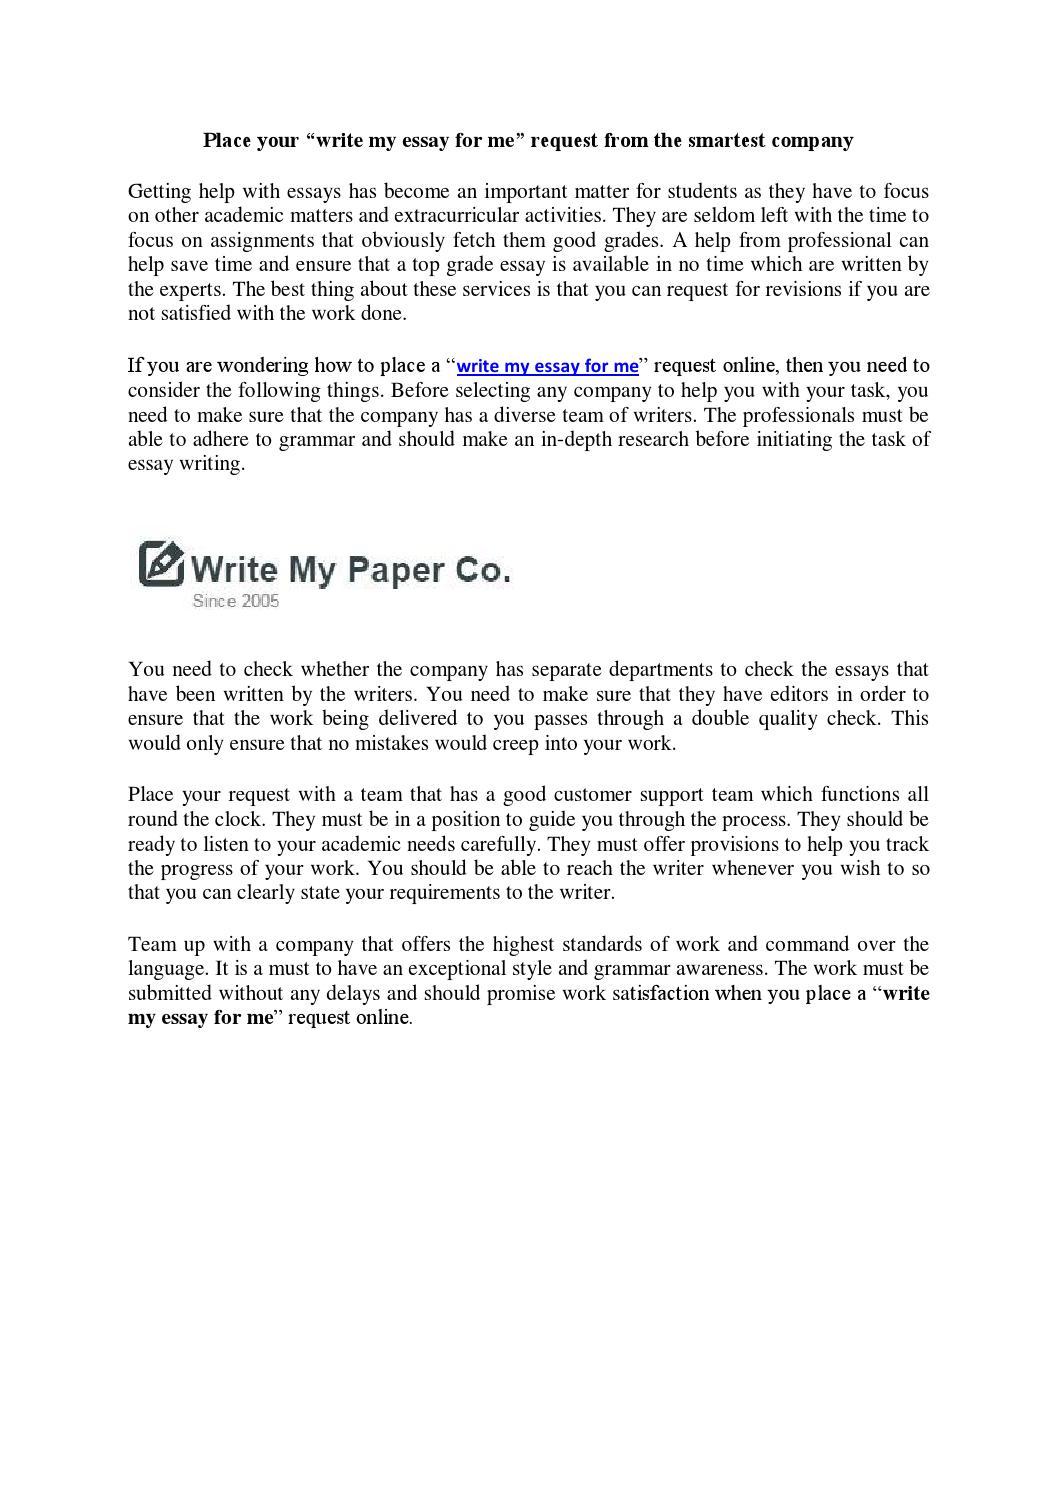 Phd dissertation writing services uk visa